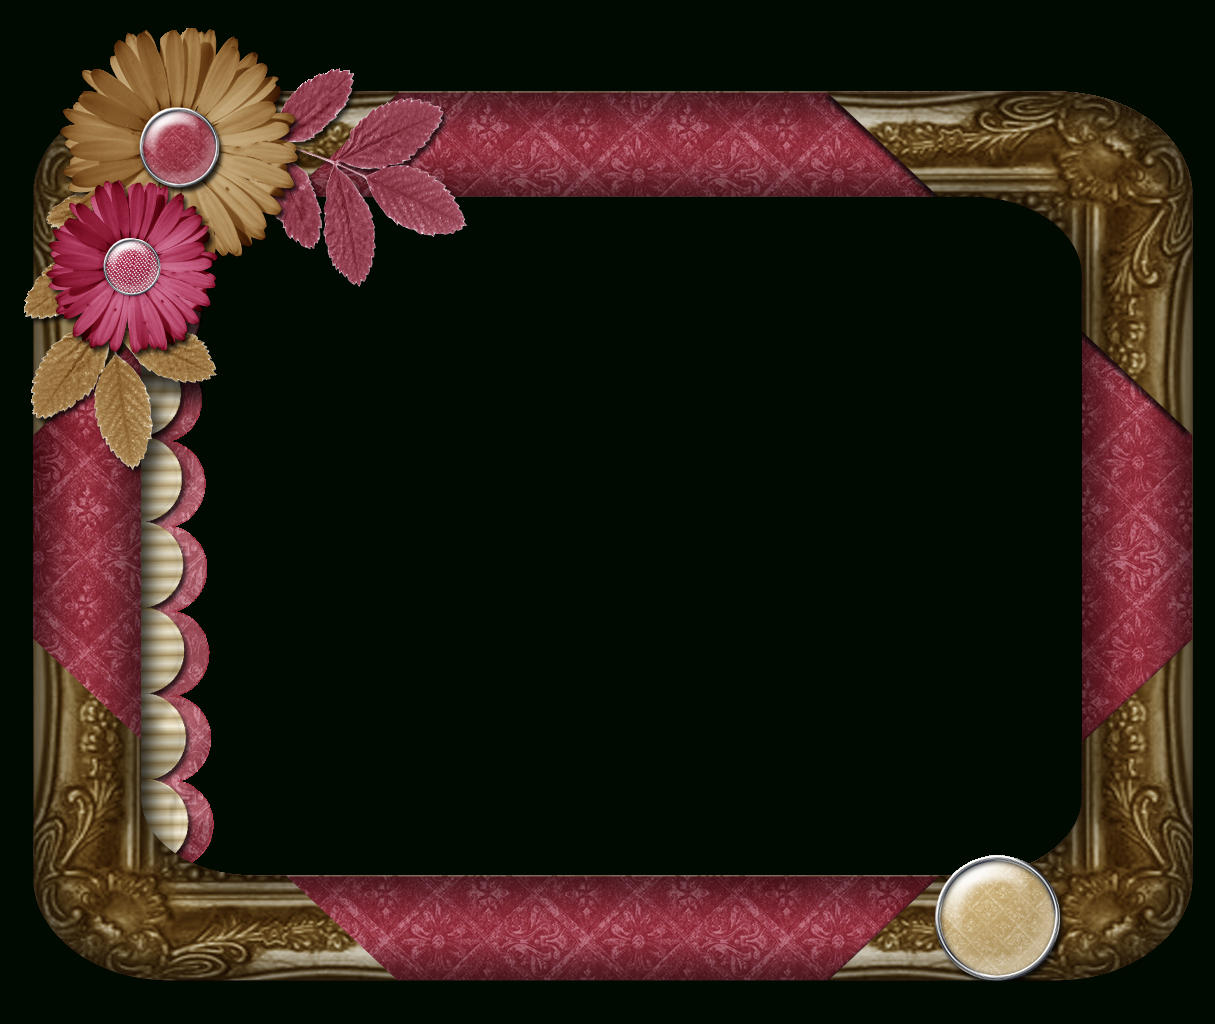 Pinrt Digital Media Marketing On Frames   Free Digital - Free Printable Frames For Scrapbooking